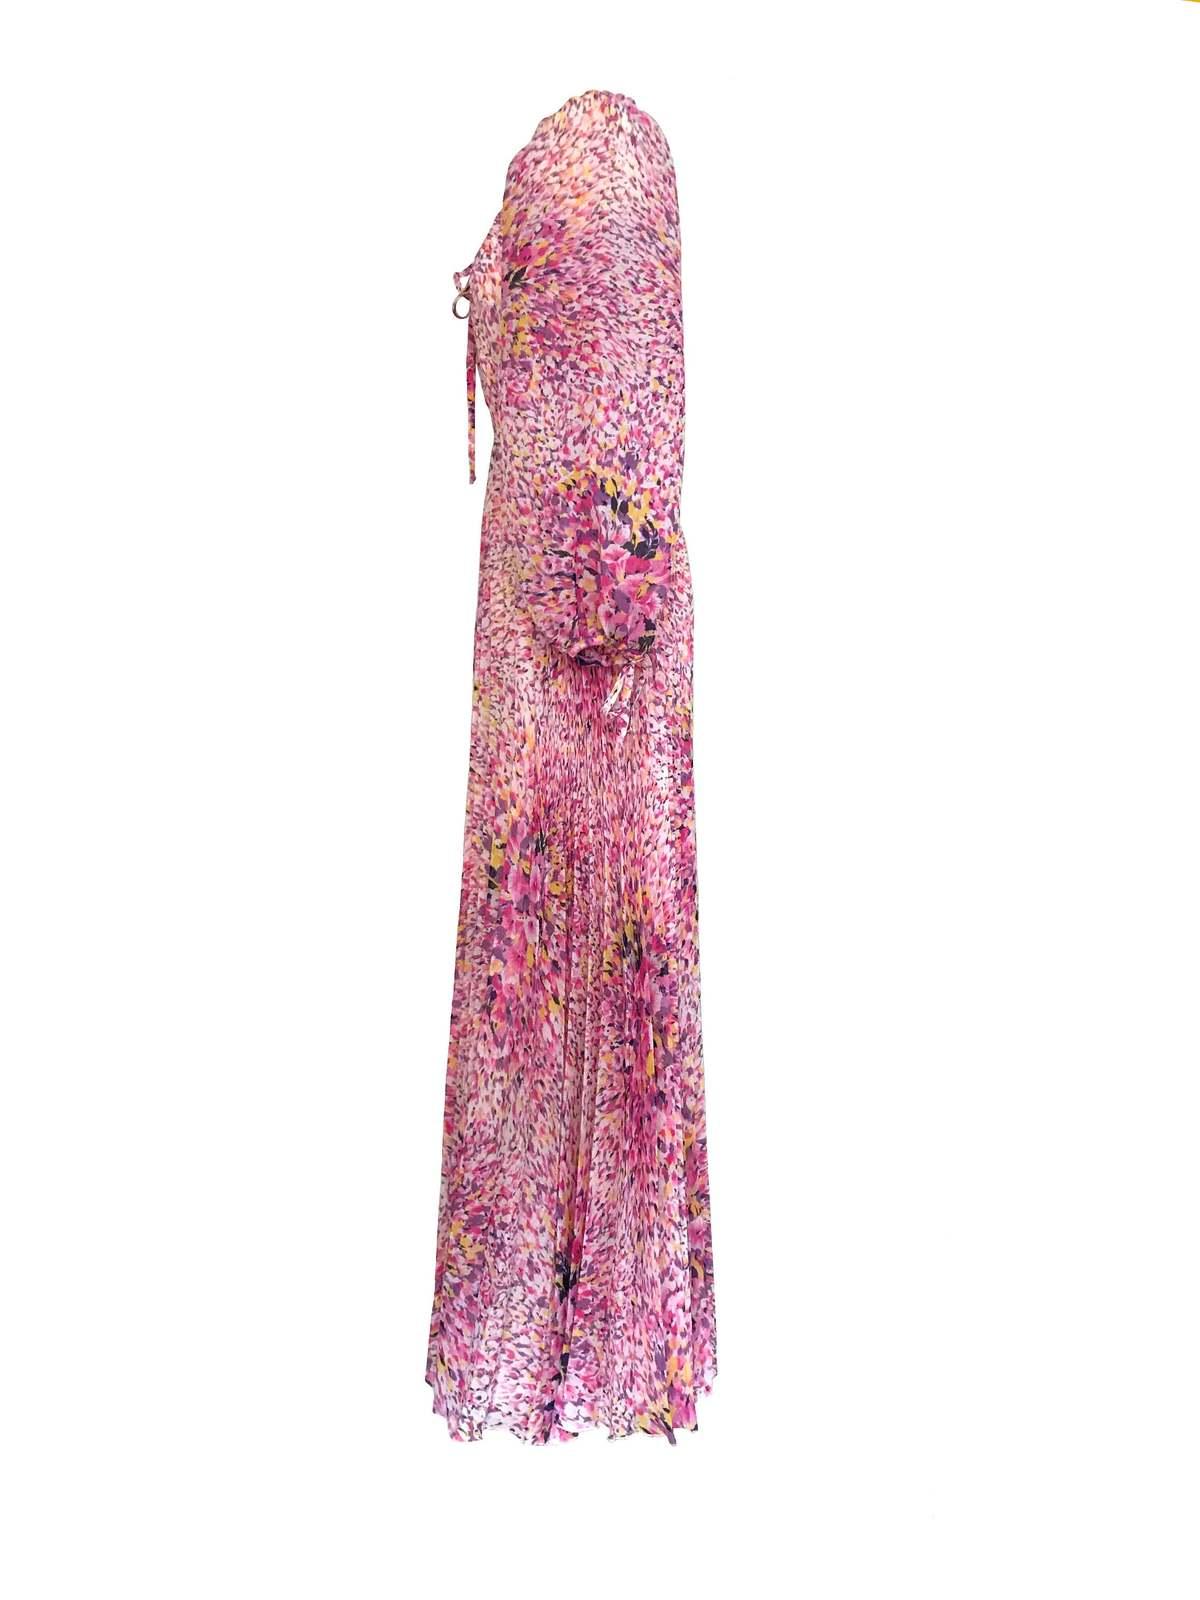 70s Vera Mont Paris Pink Purple Yellow Abstract Print Pleated Boho Maxi Dress